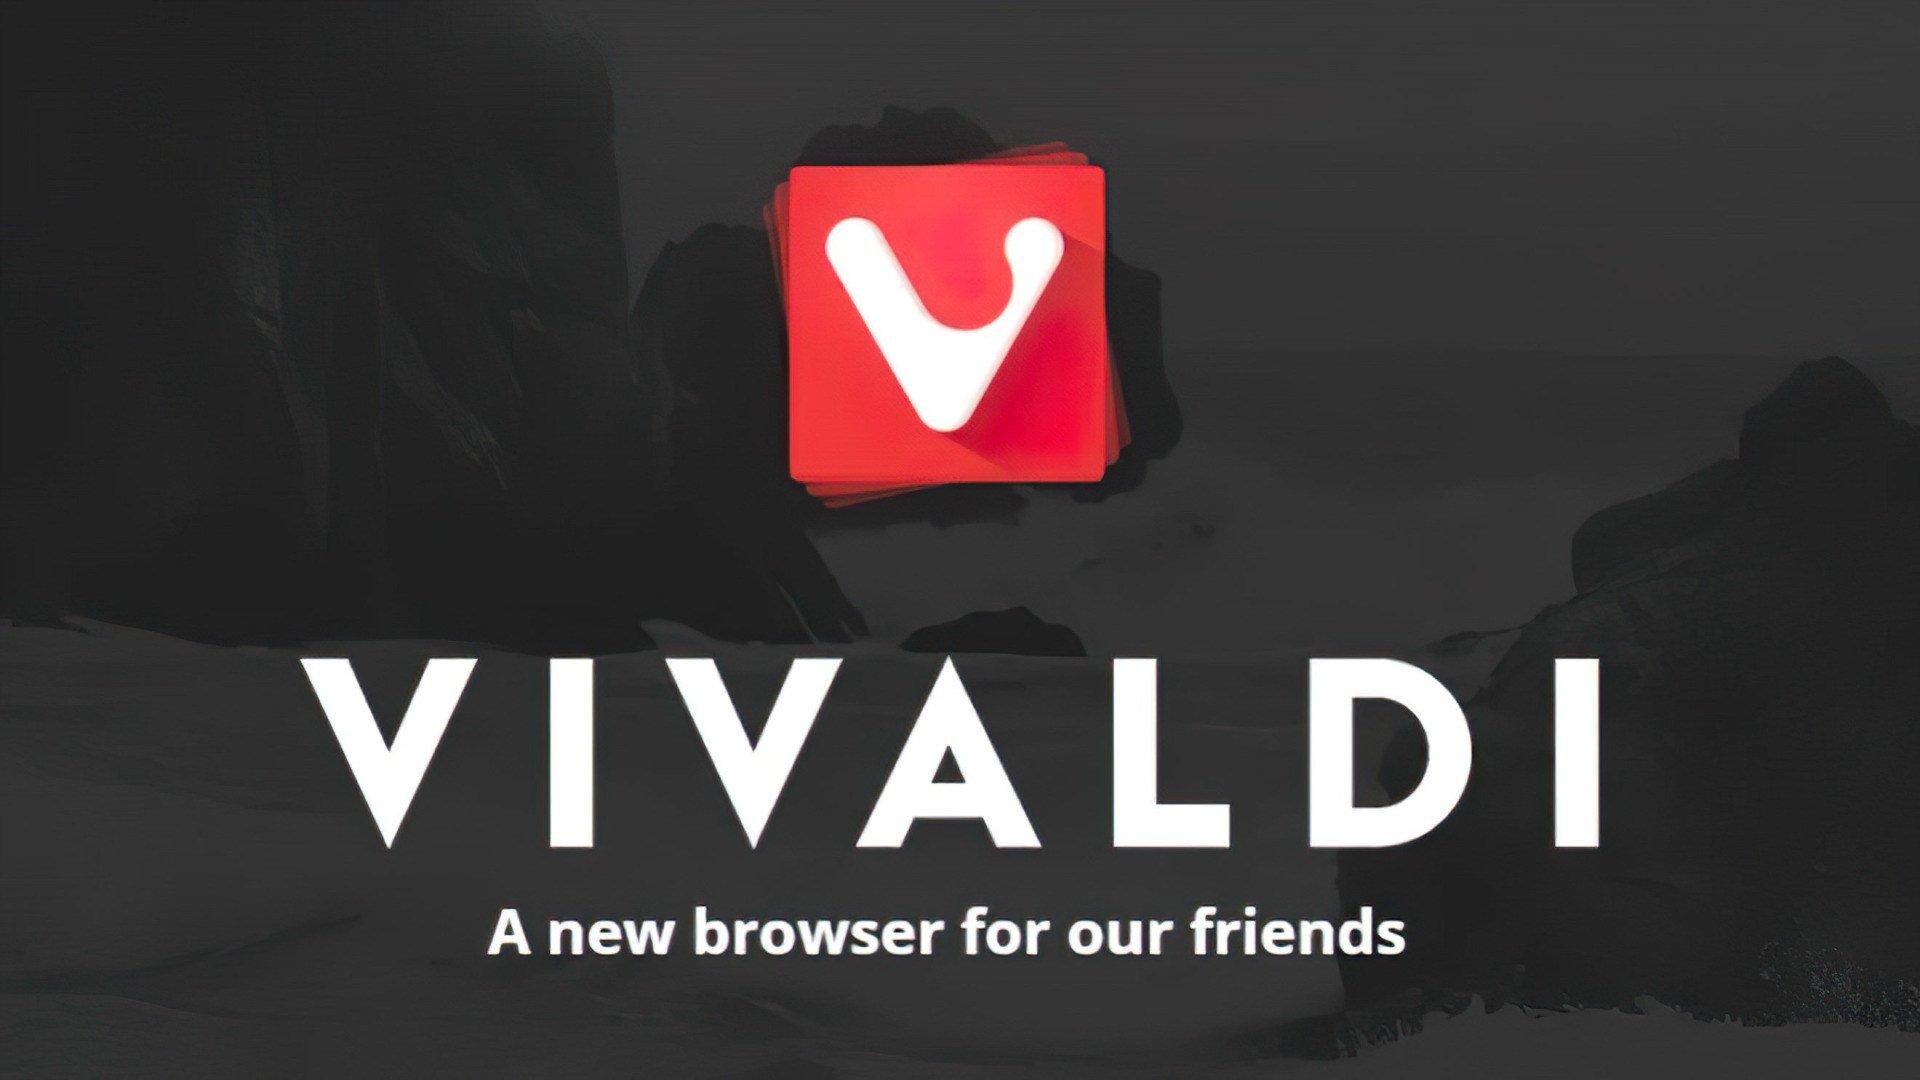 Browser, Vivaldi, Tech Preview